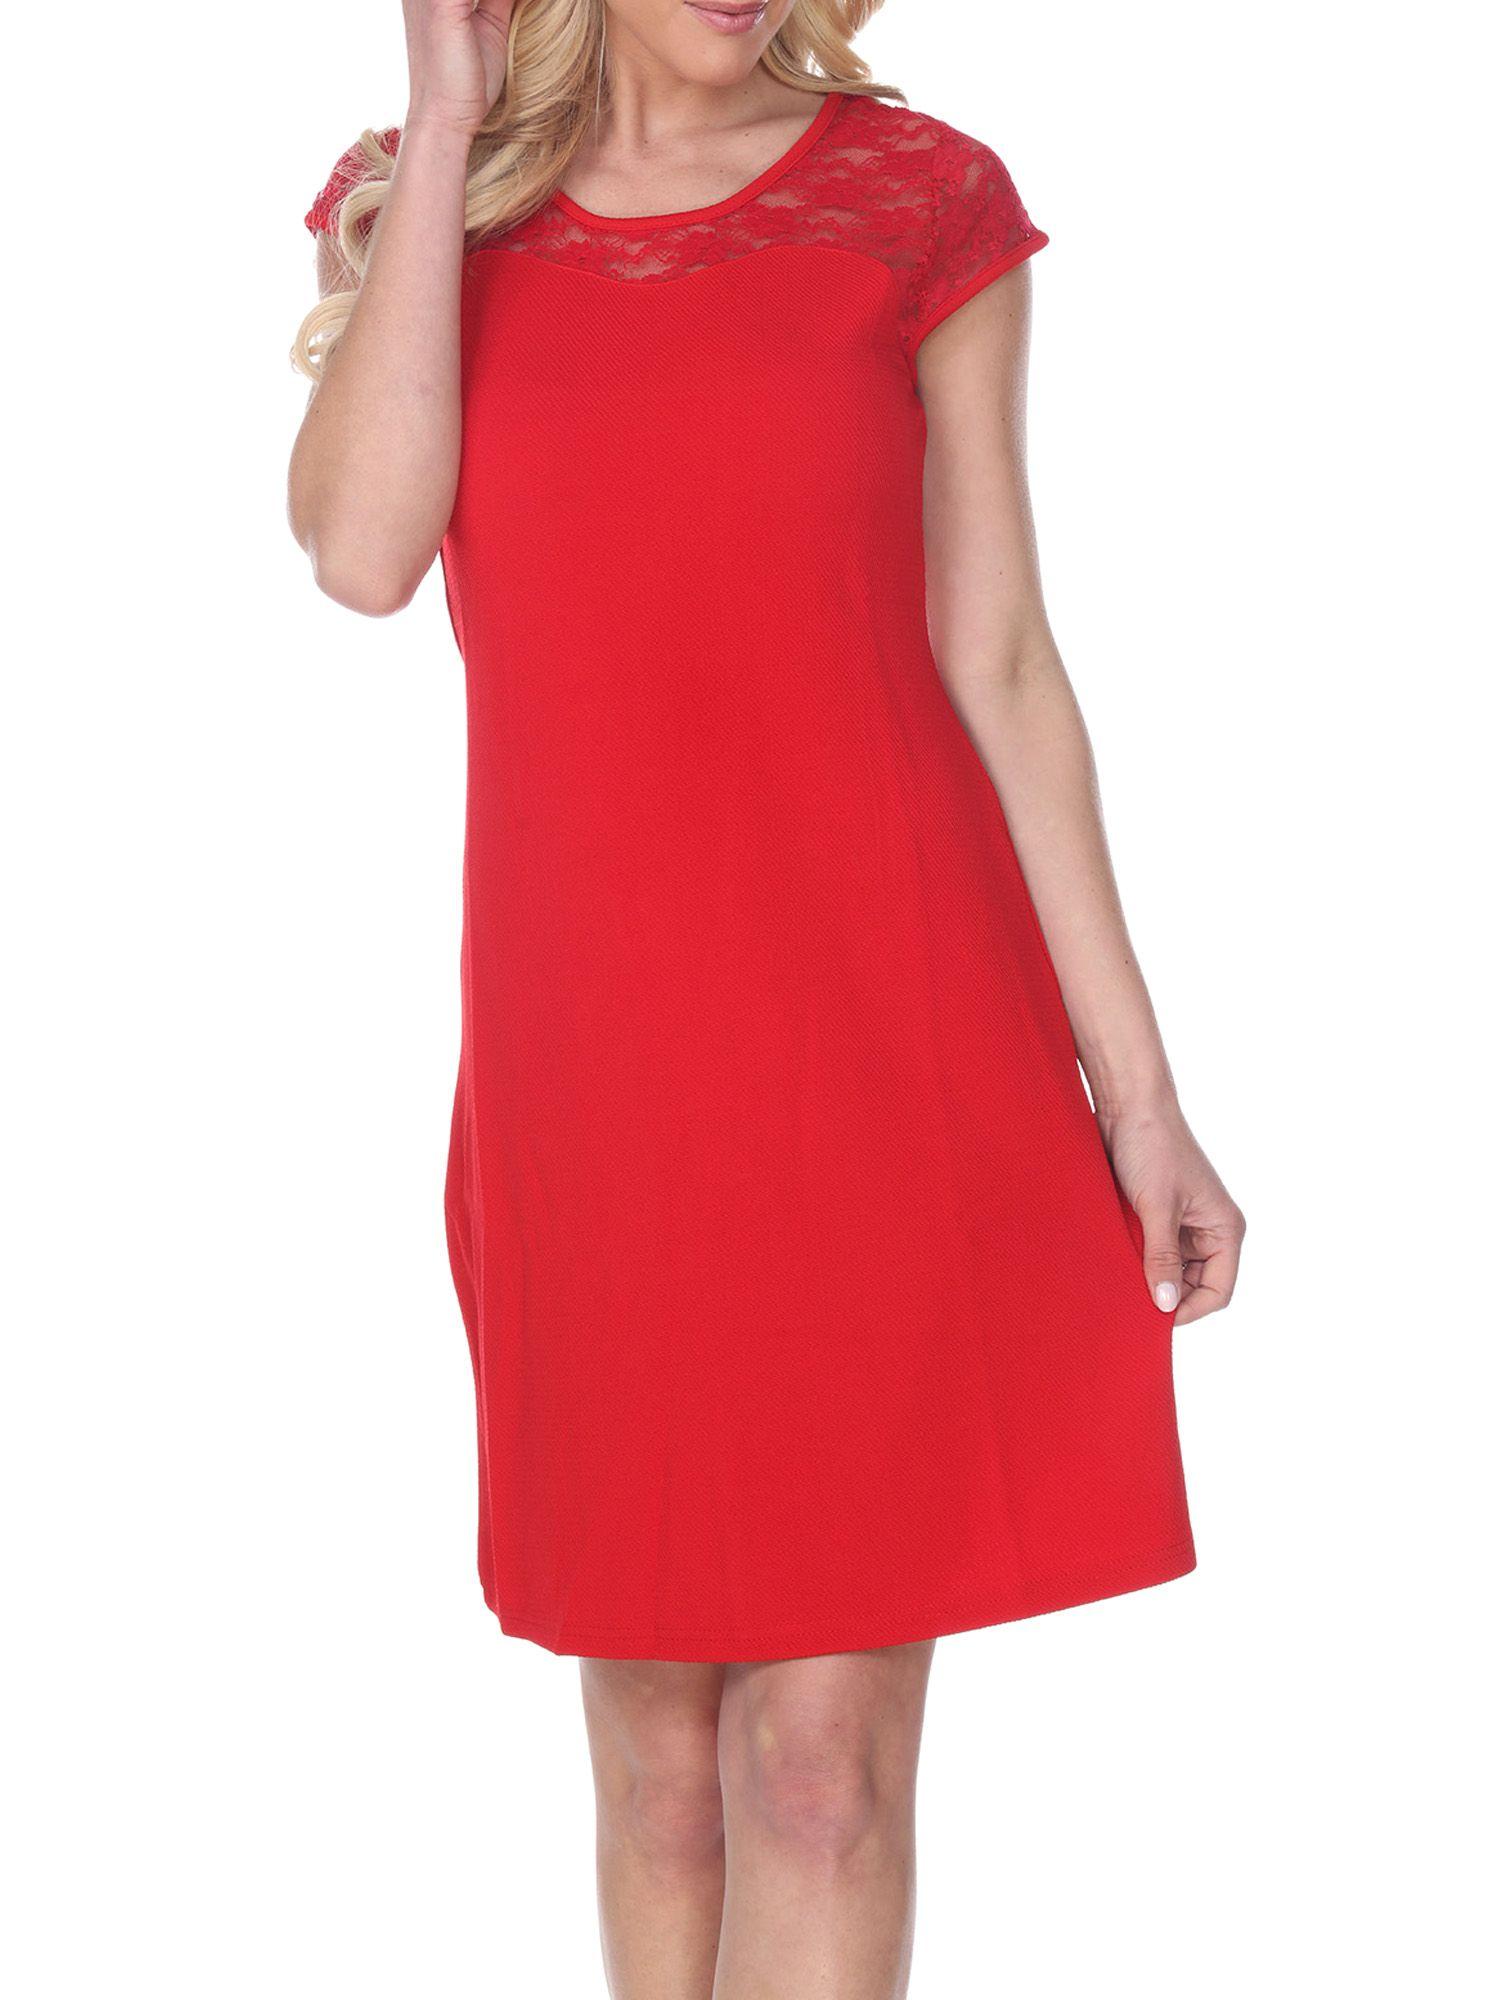 Women S Lace Detailed A Line Dress Walmart Com A Line Dress Women Lace Dresses [ 2000 x 1500 Pixel ]